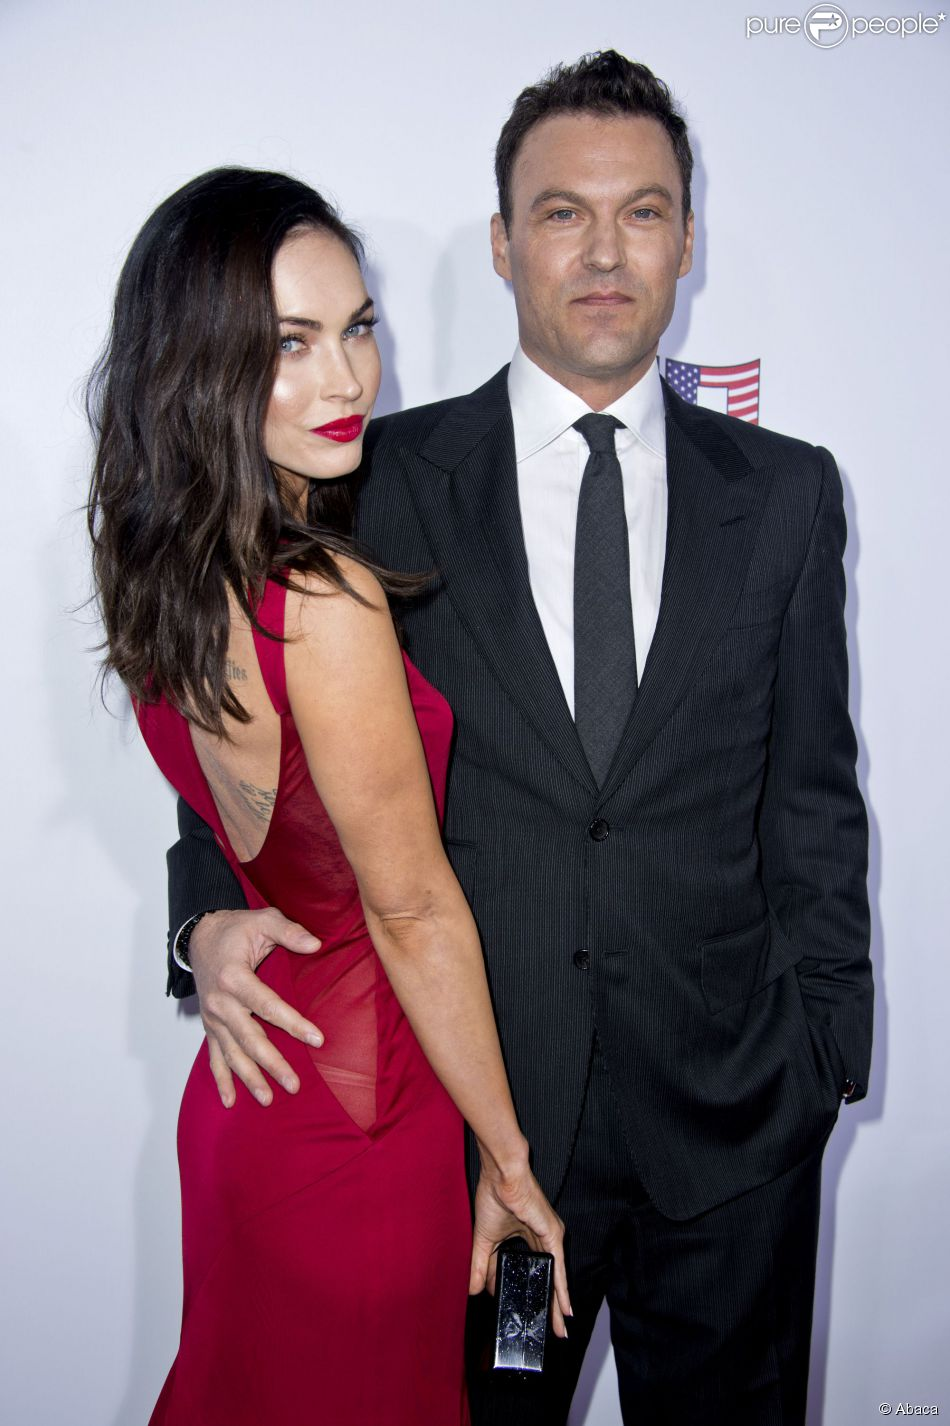 Megan fox et son mari brian austin green victimes d 39 un accident de voiture - Charlotte de turckheim et son mari ...